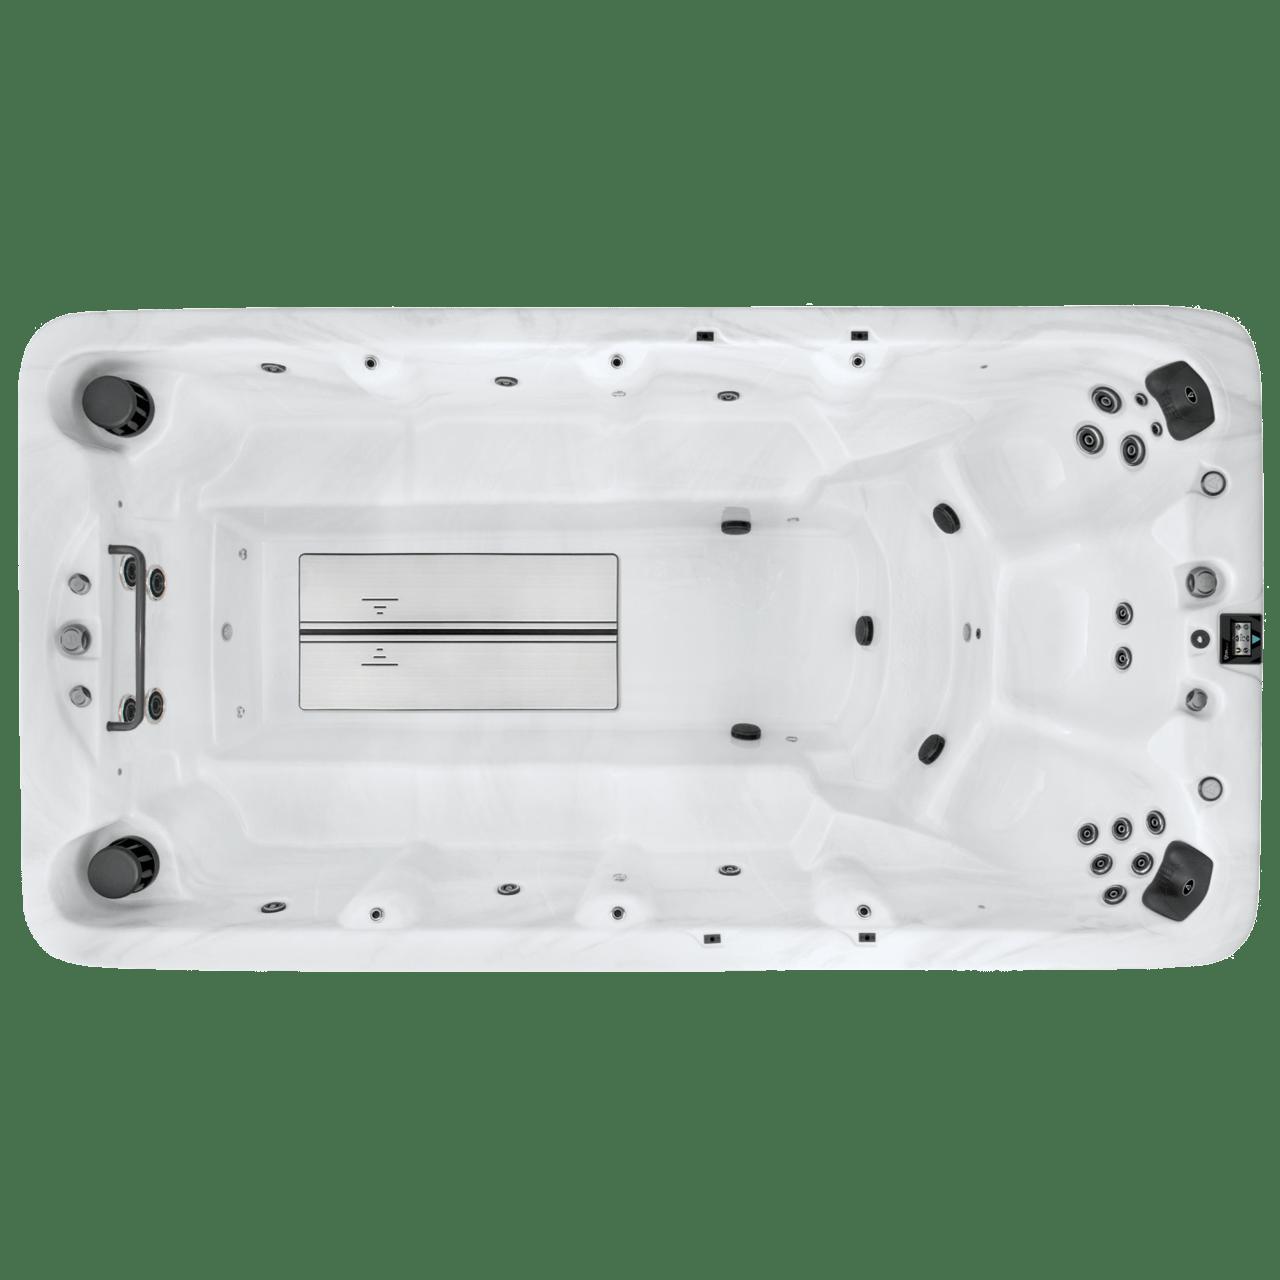 Vita STR - XB4 - Swim Spa